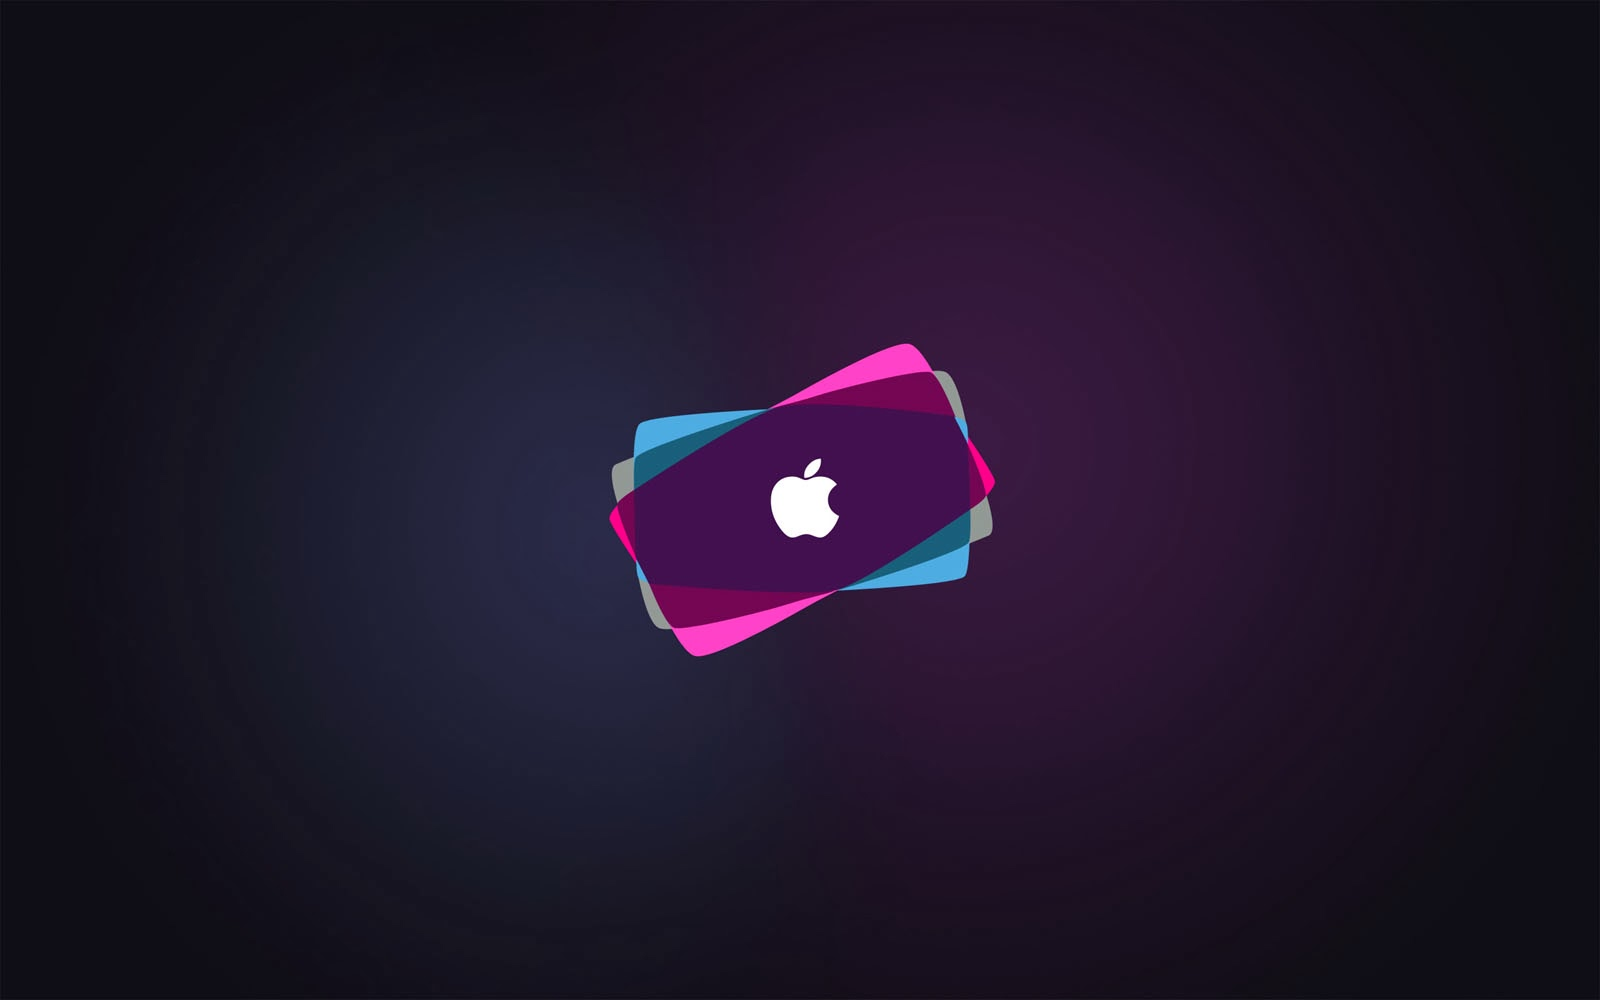 apple computer wallpaper,pink,magenta,logo,font,animation